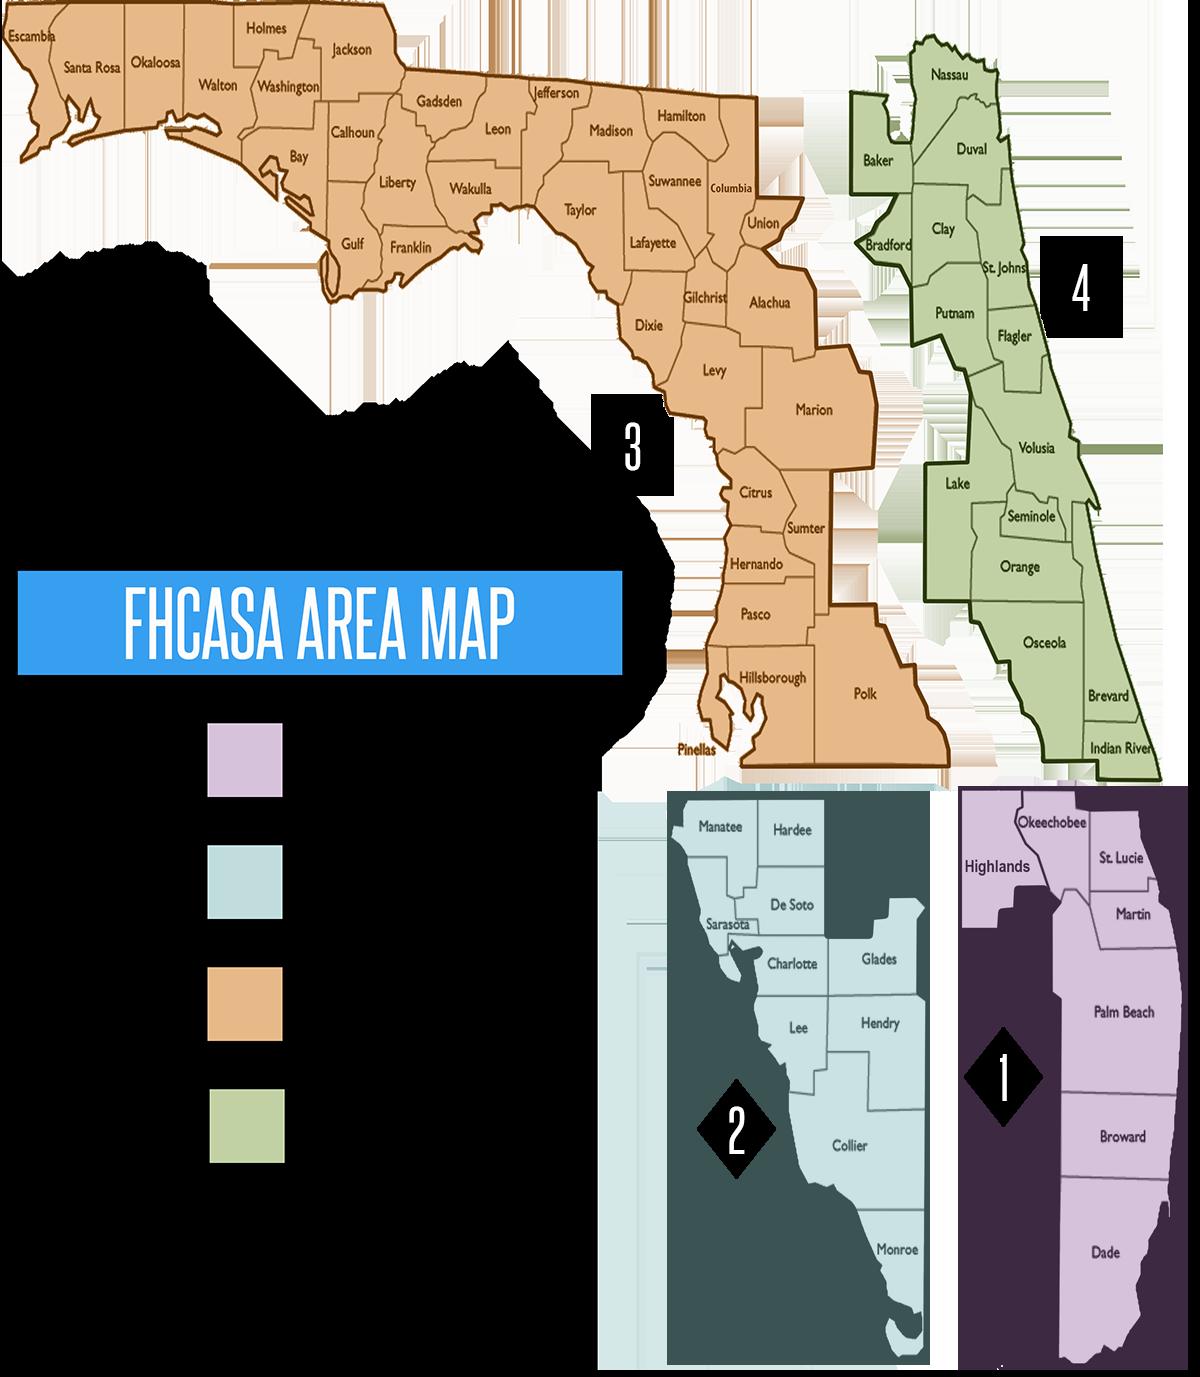 Florida Area Map.Area Map Florida Half Century Amateur Softball Association